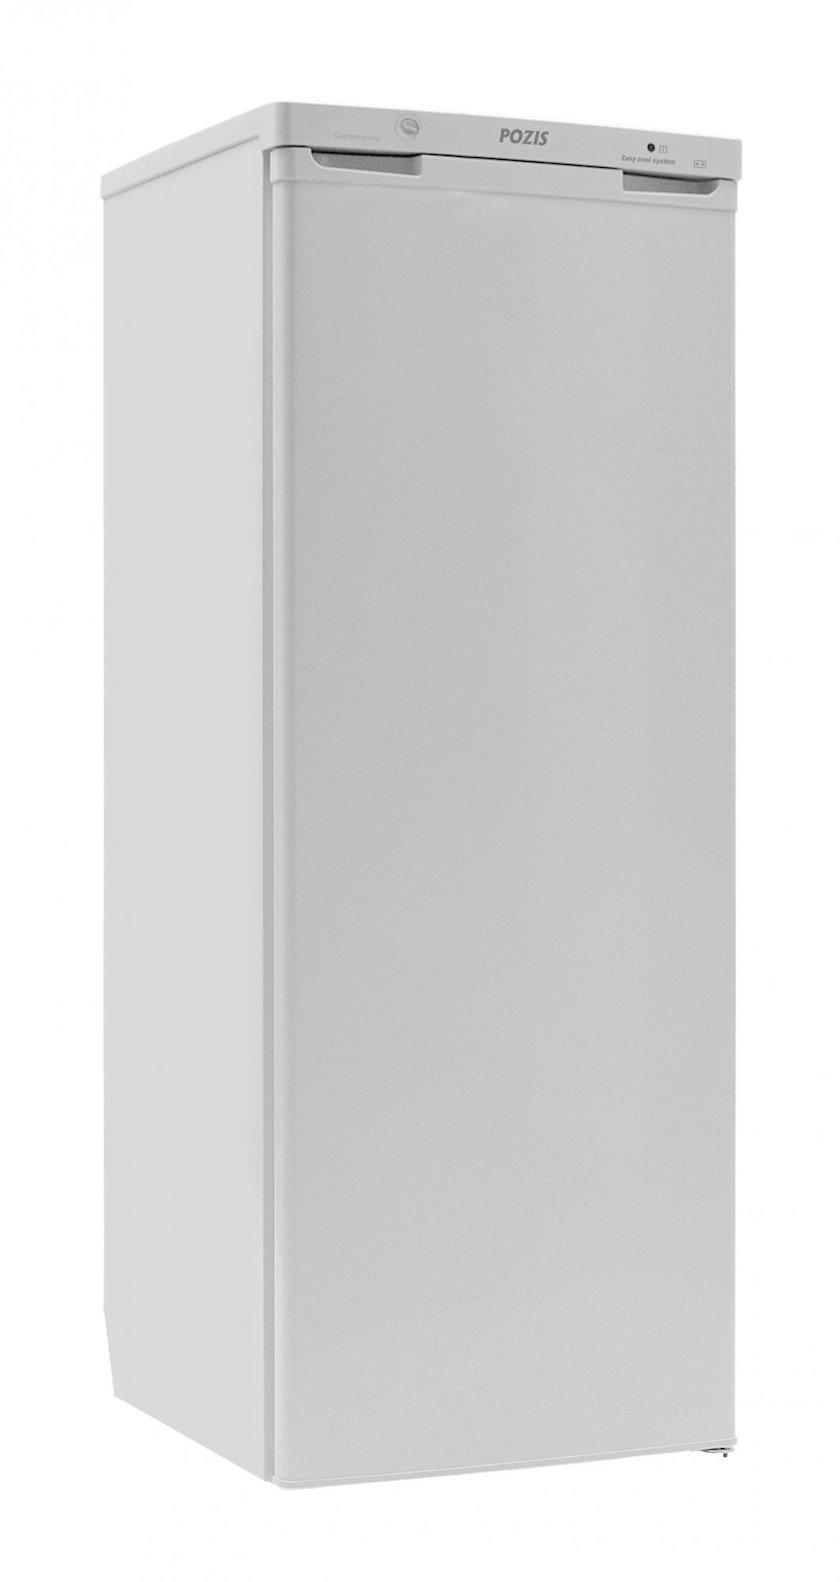 Soyuducu Pozis RS 416 White